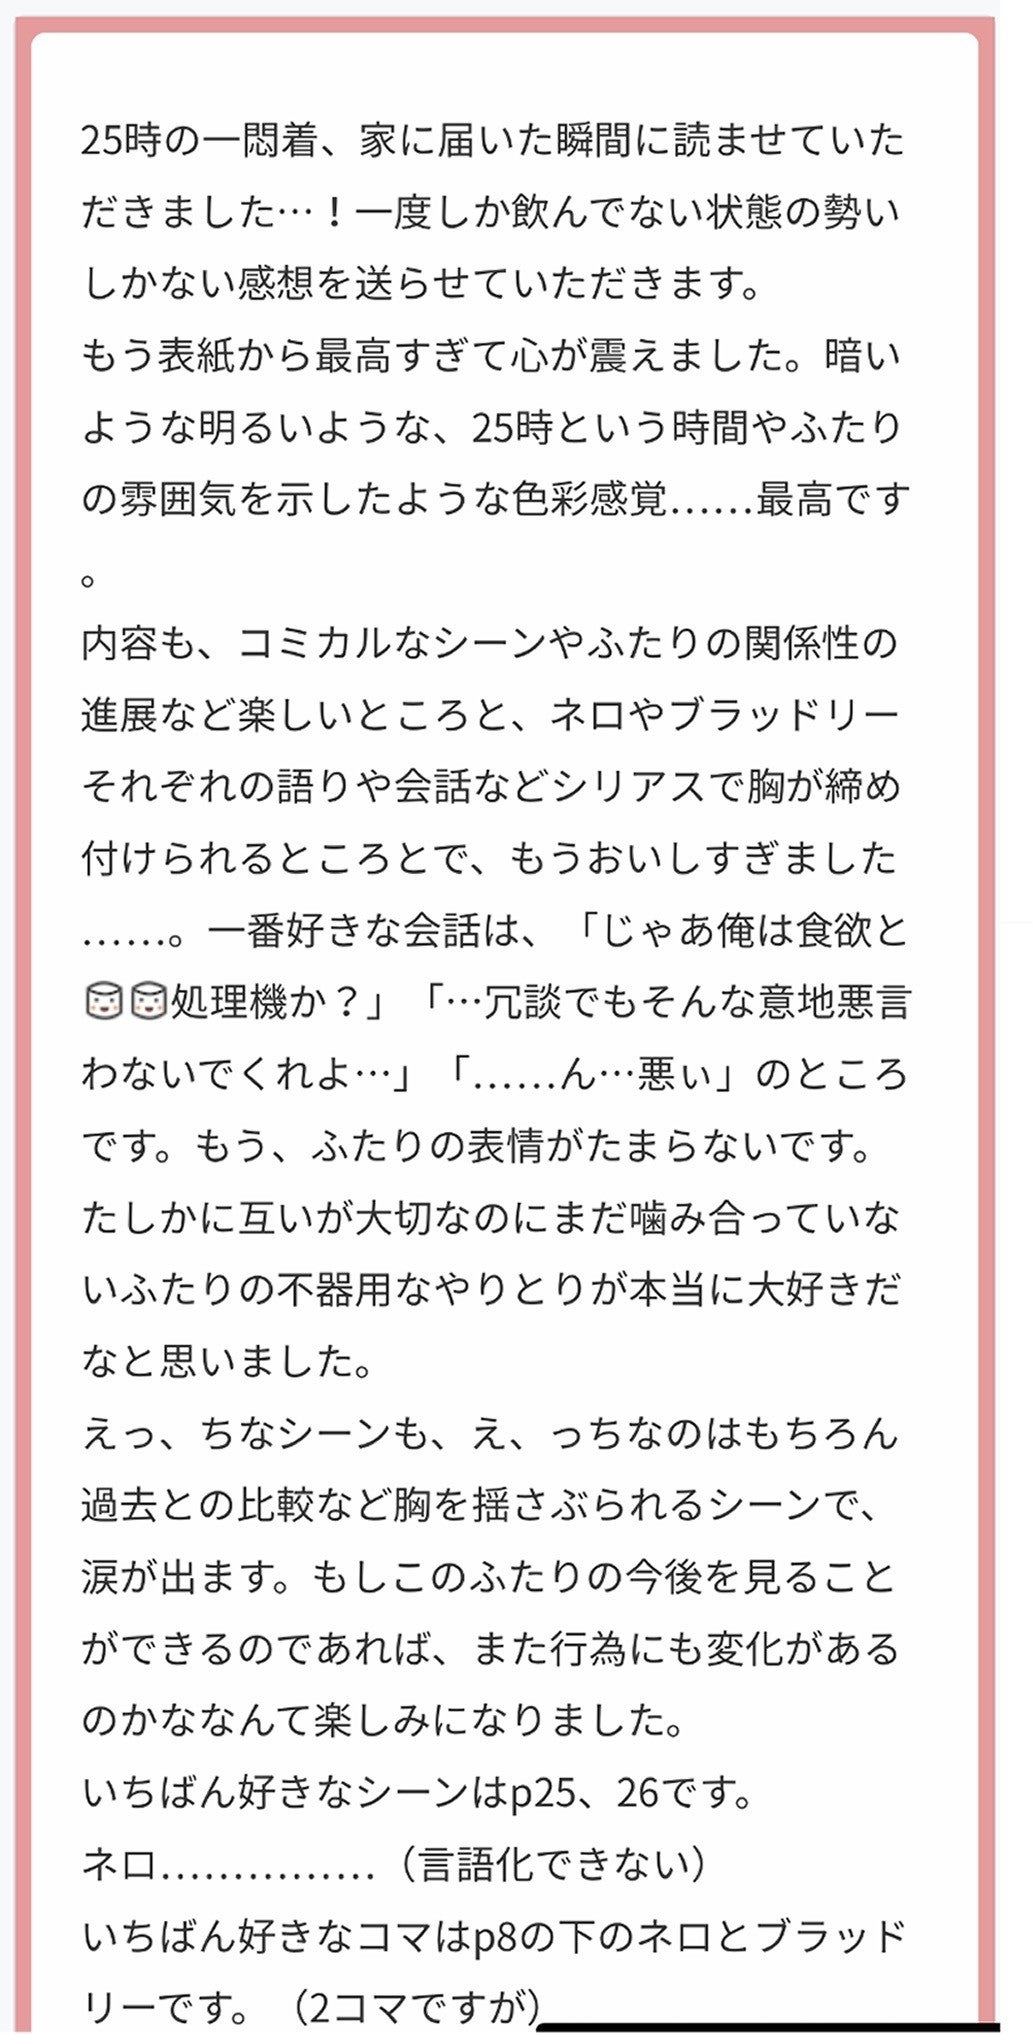 25時の一悶着:感想返信③(〜6/27)|芯|note